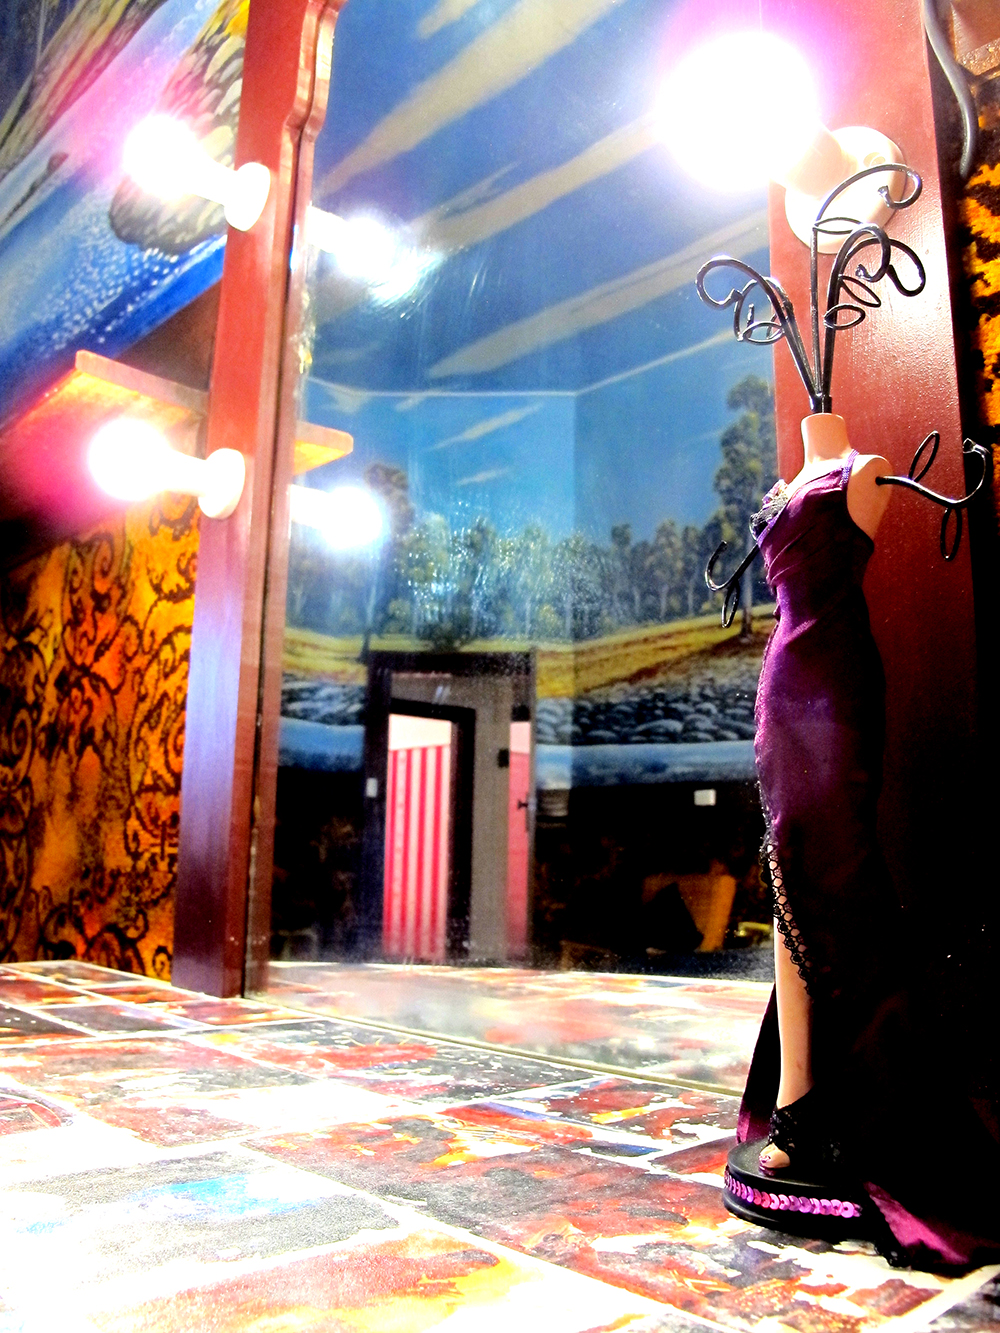 palace-hotel-priscilla-suite-mirror_dressor.jpg